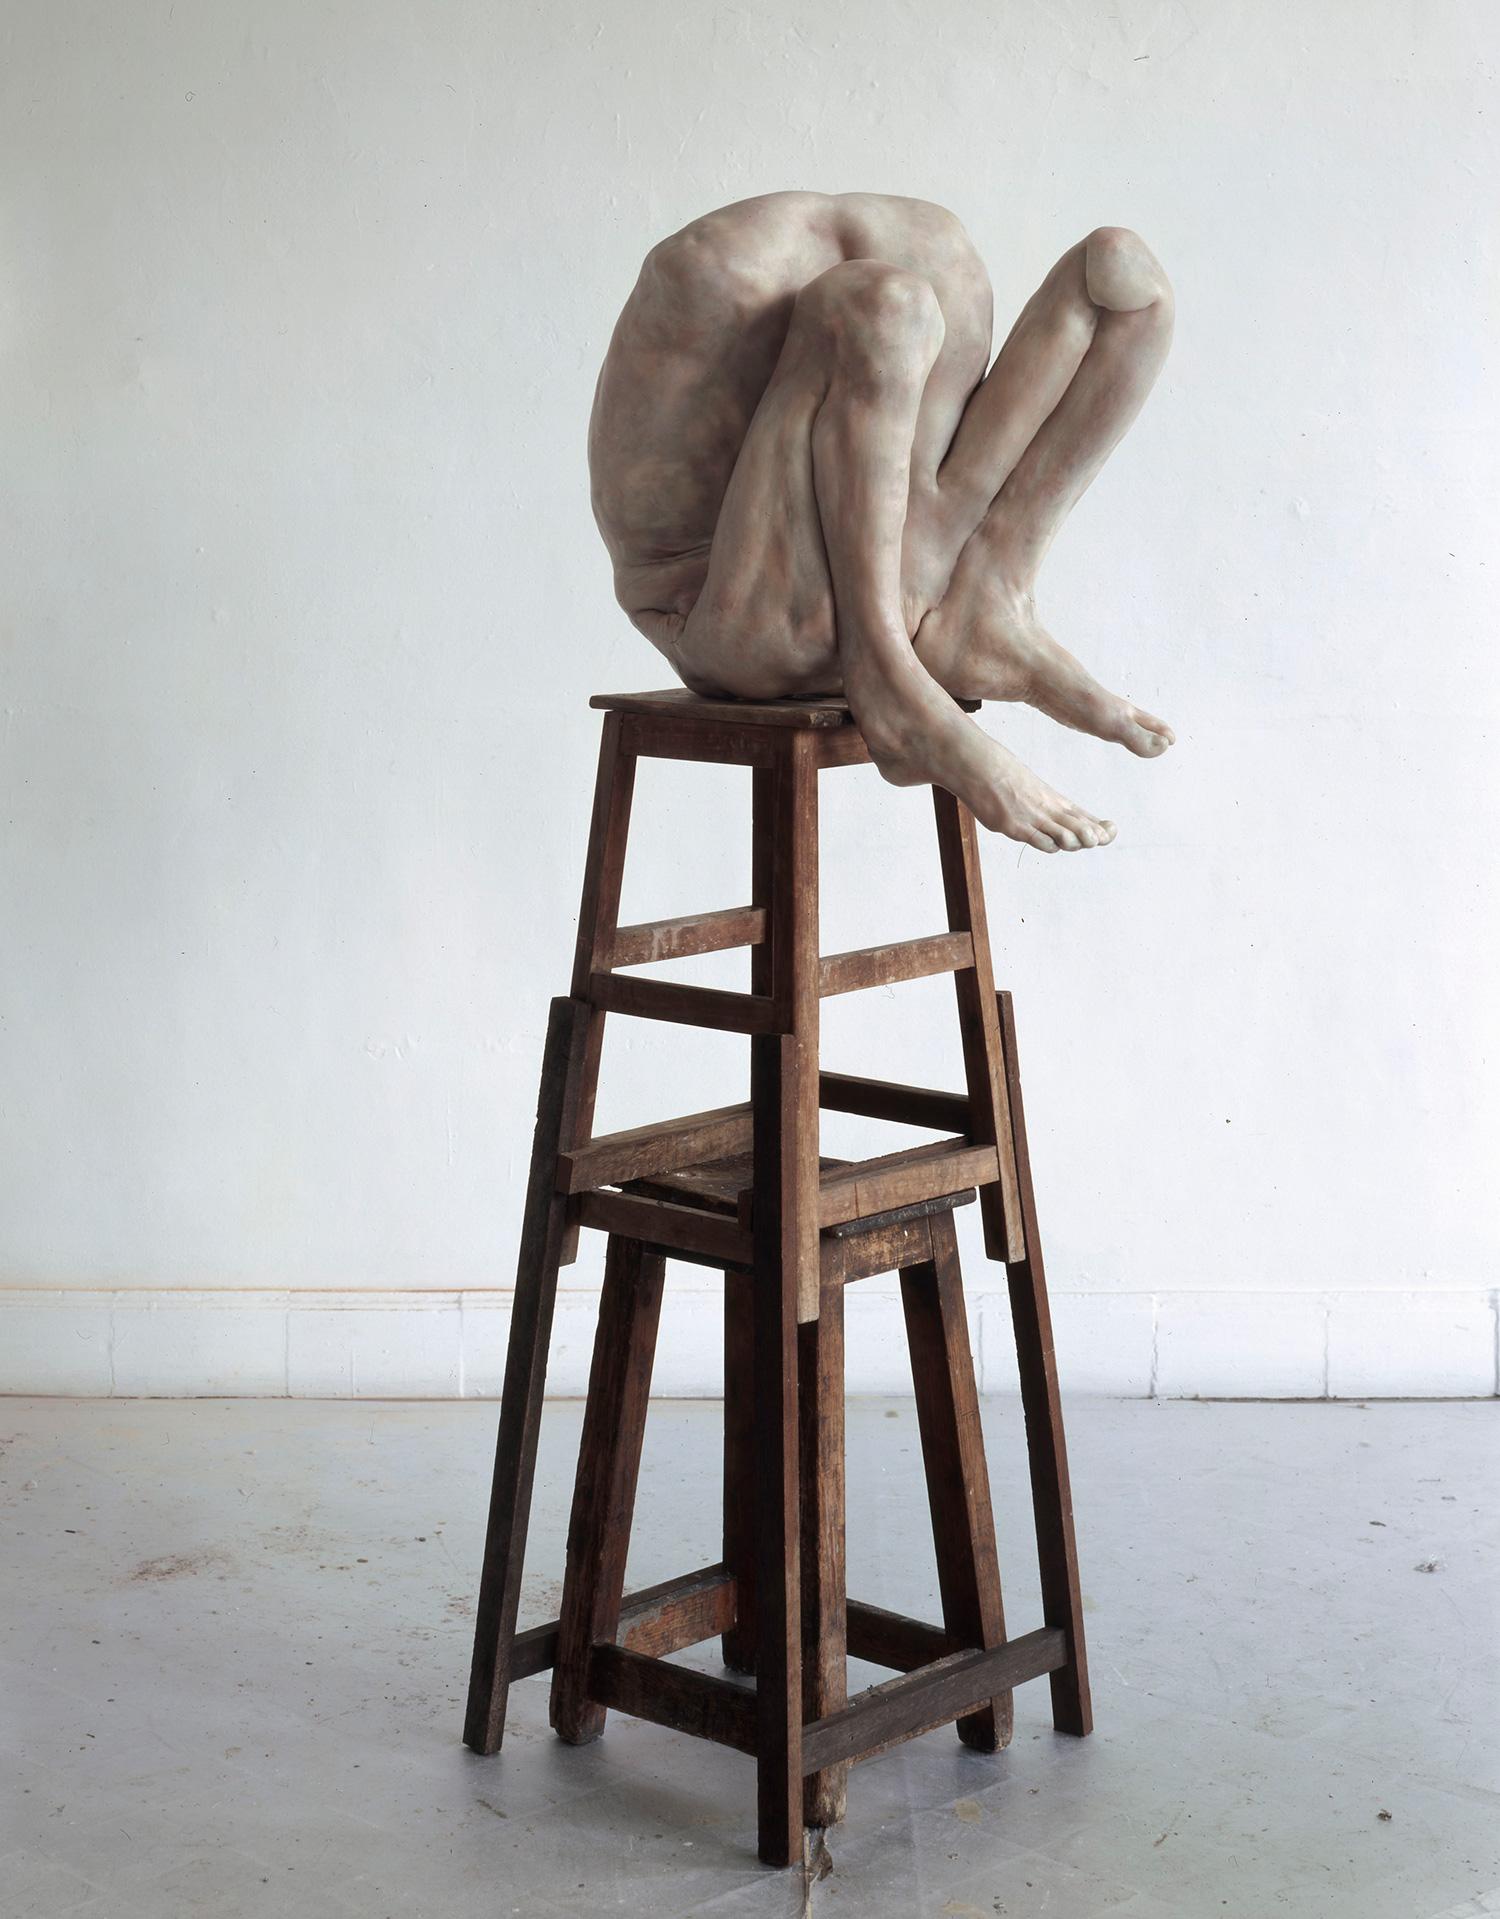 Berlinde de Bruyckere - torso and legs on stool